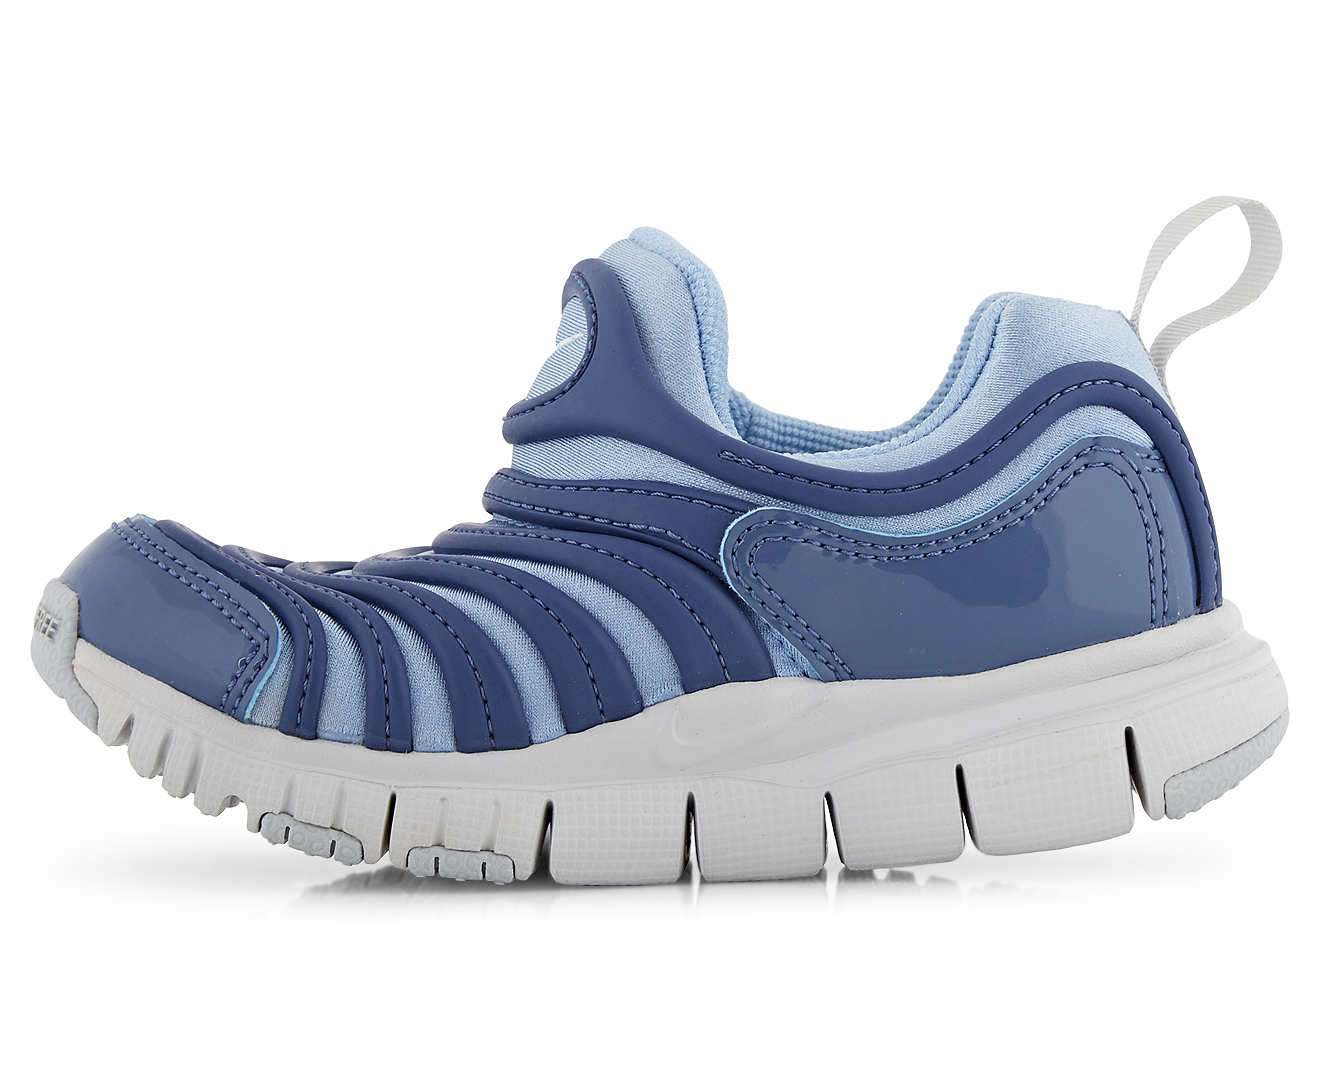 43e4eb5820056 Nike Girls  Pre-School Dynamo Free (PS) Shoe - Aluminium Pure Platinum